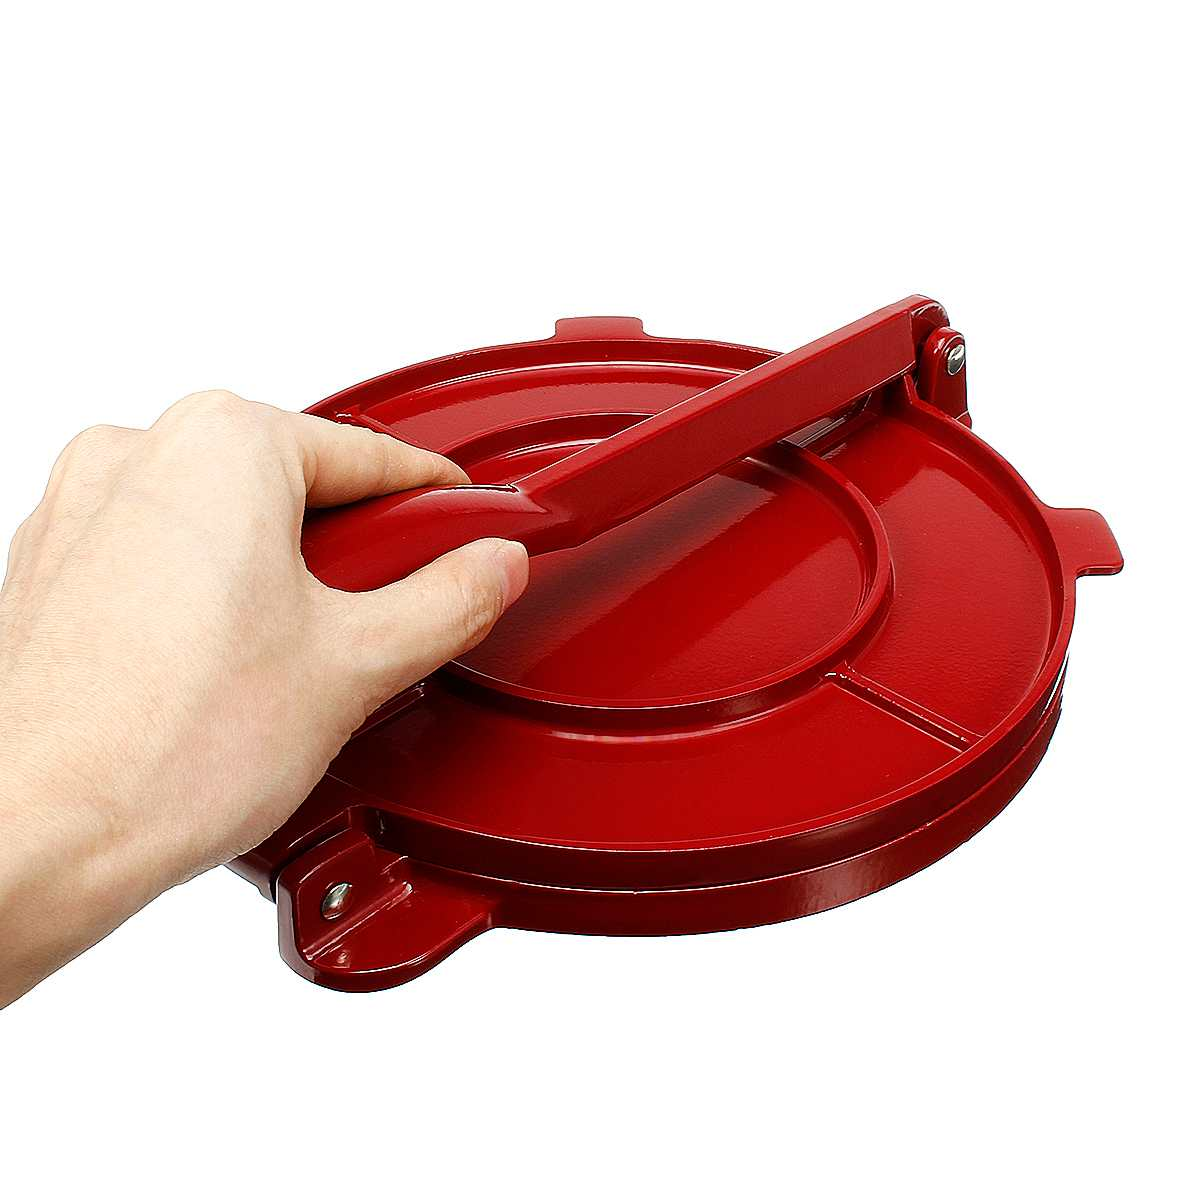 New Foldable 8 Inches Tortilla Press Maker Aluminum Flour Corn Baking Tool Bakeware DIY Pie Tools Gadgets Red Kitchen Accessorie